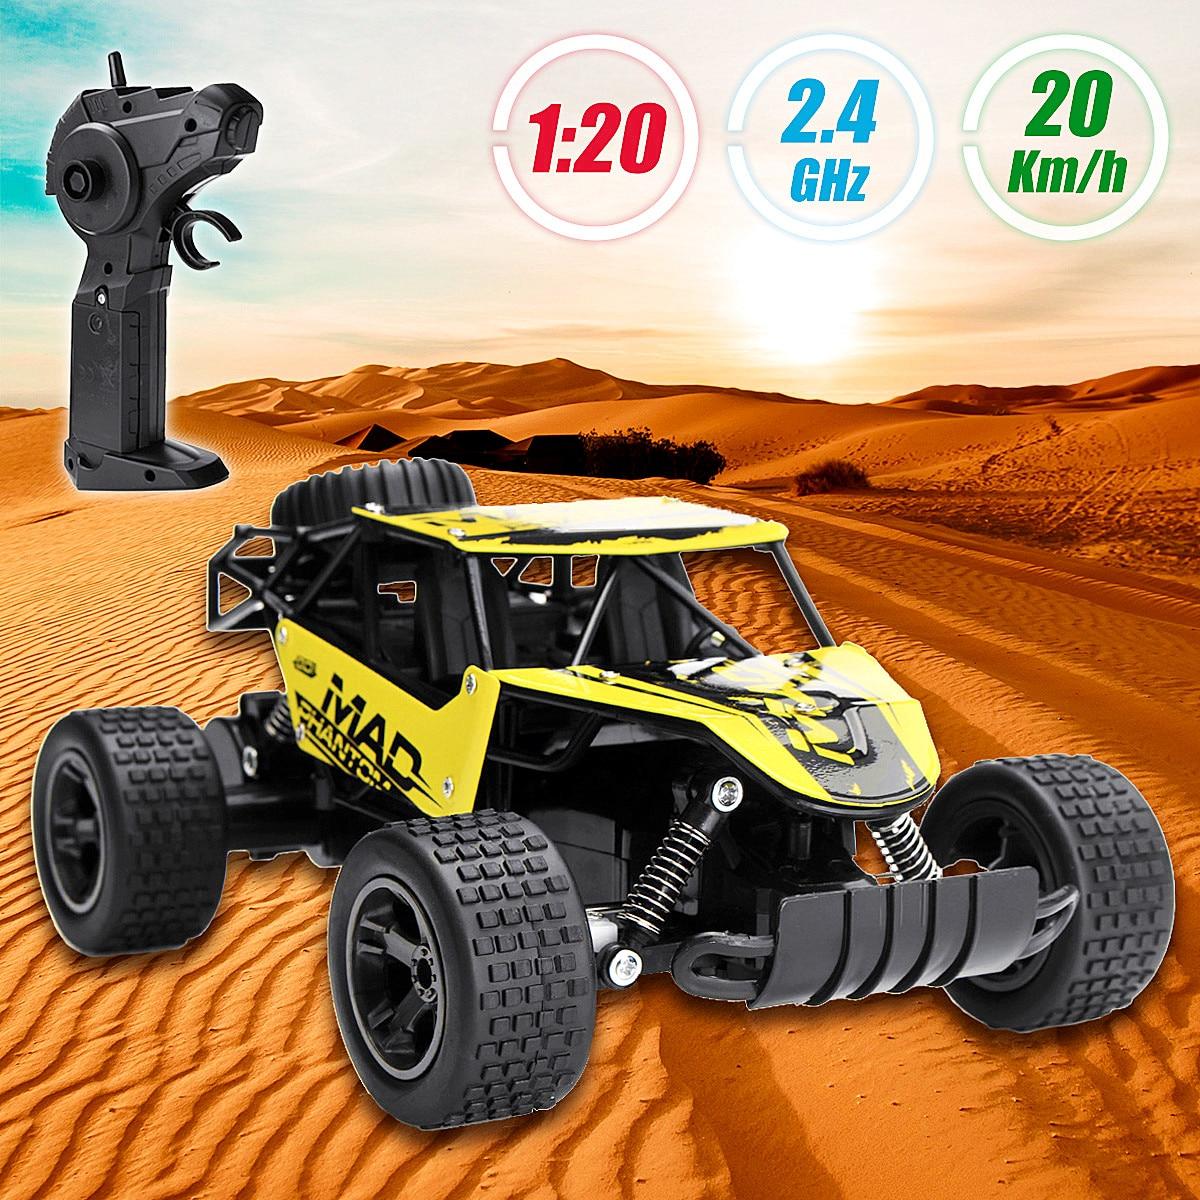 1:20 High Speed 2.4Ghz Remote Control Rock Crawler Racing